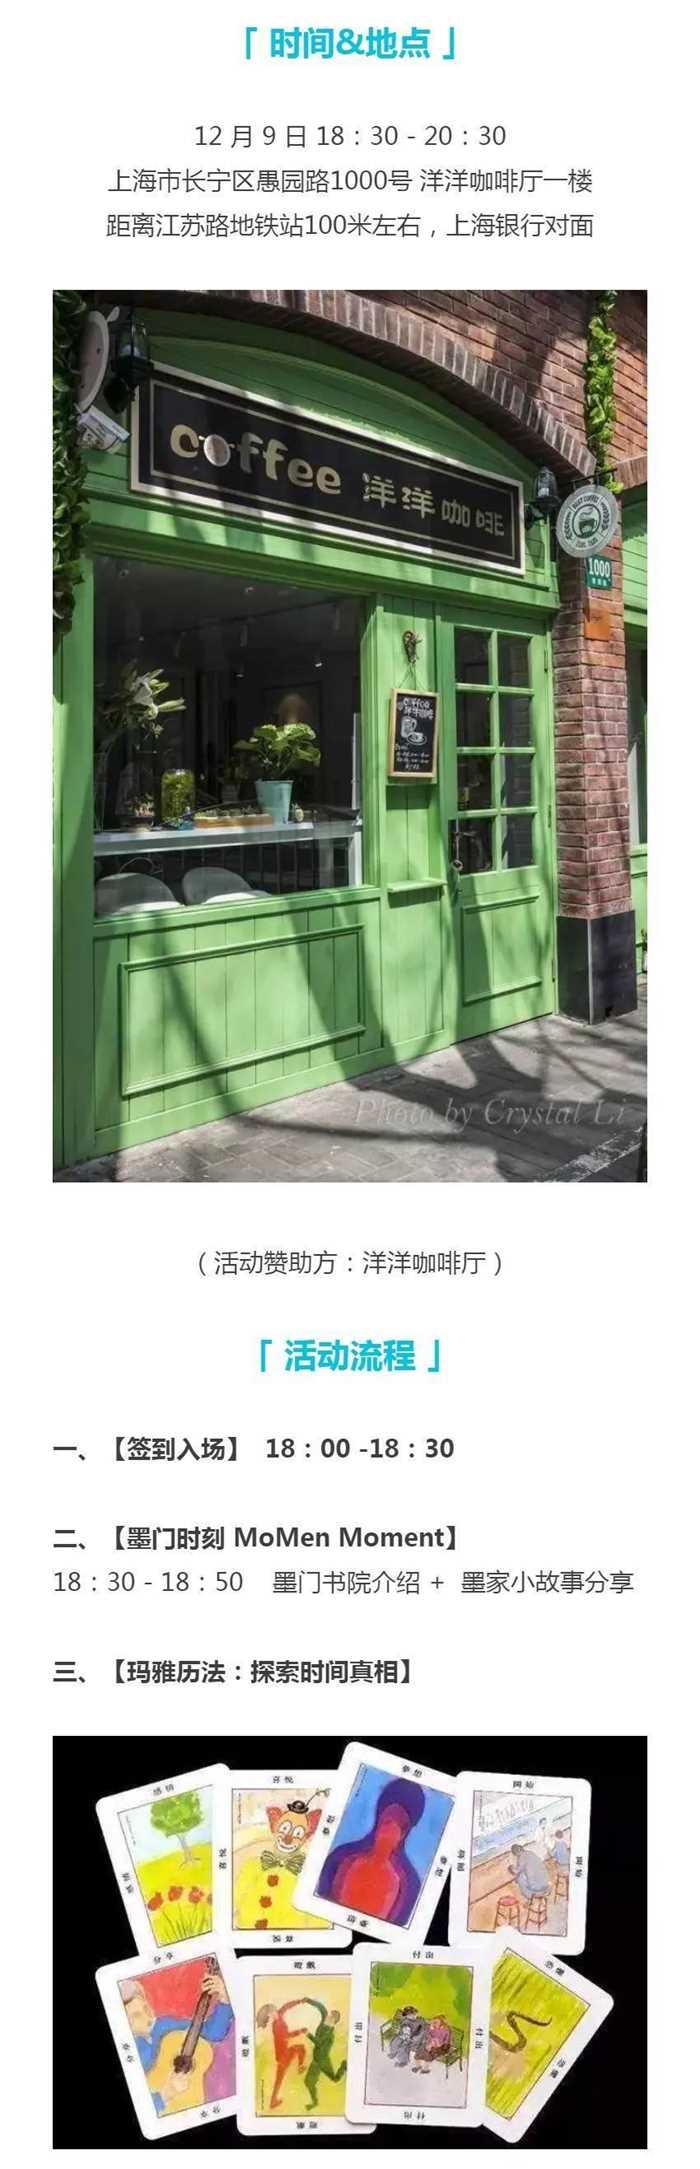 mp.weixin.qq.com_s_oqUz2r3stmF6wkLHEGu8ww1.jpg